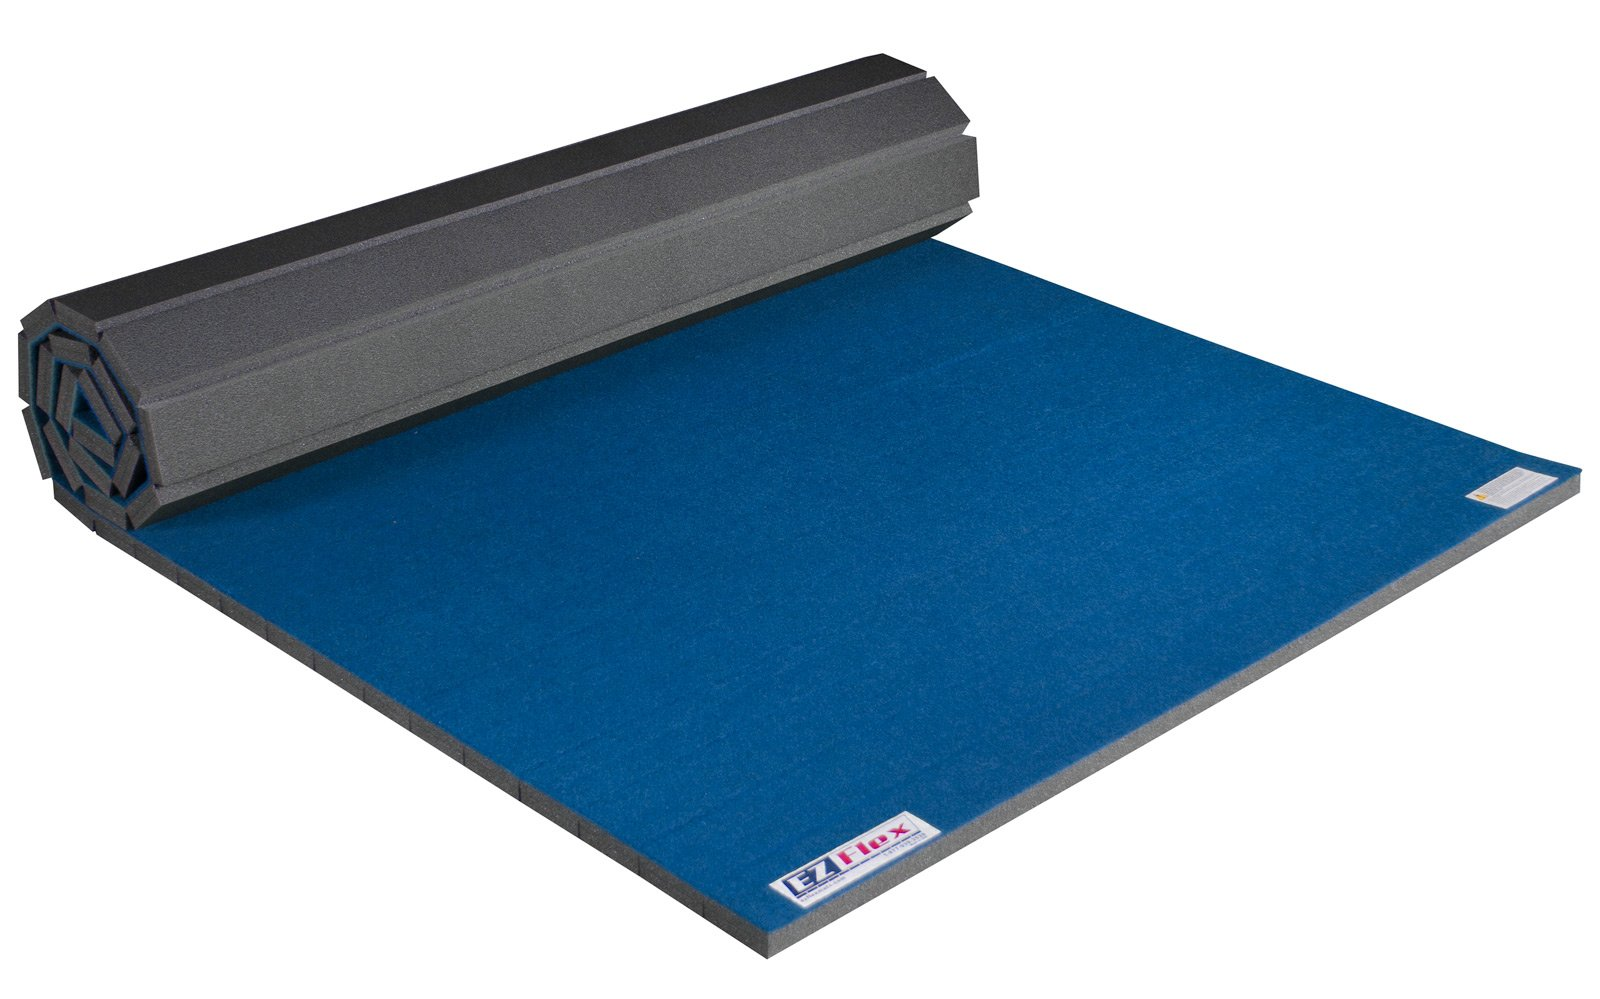 EZ Flex 5' x 10' Home Cheerleading/Gymnastics Mat (Blue)